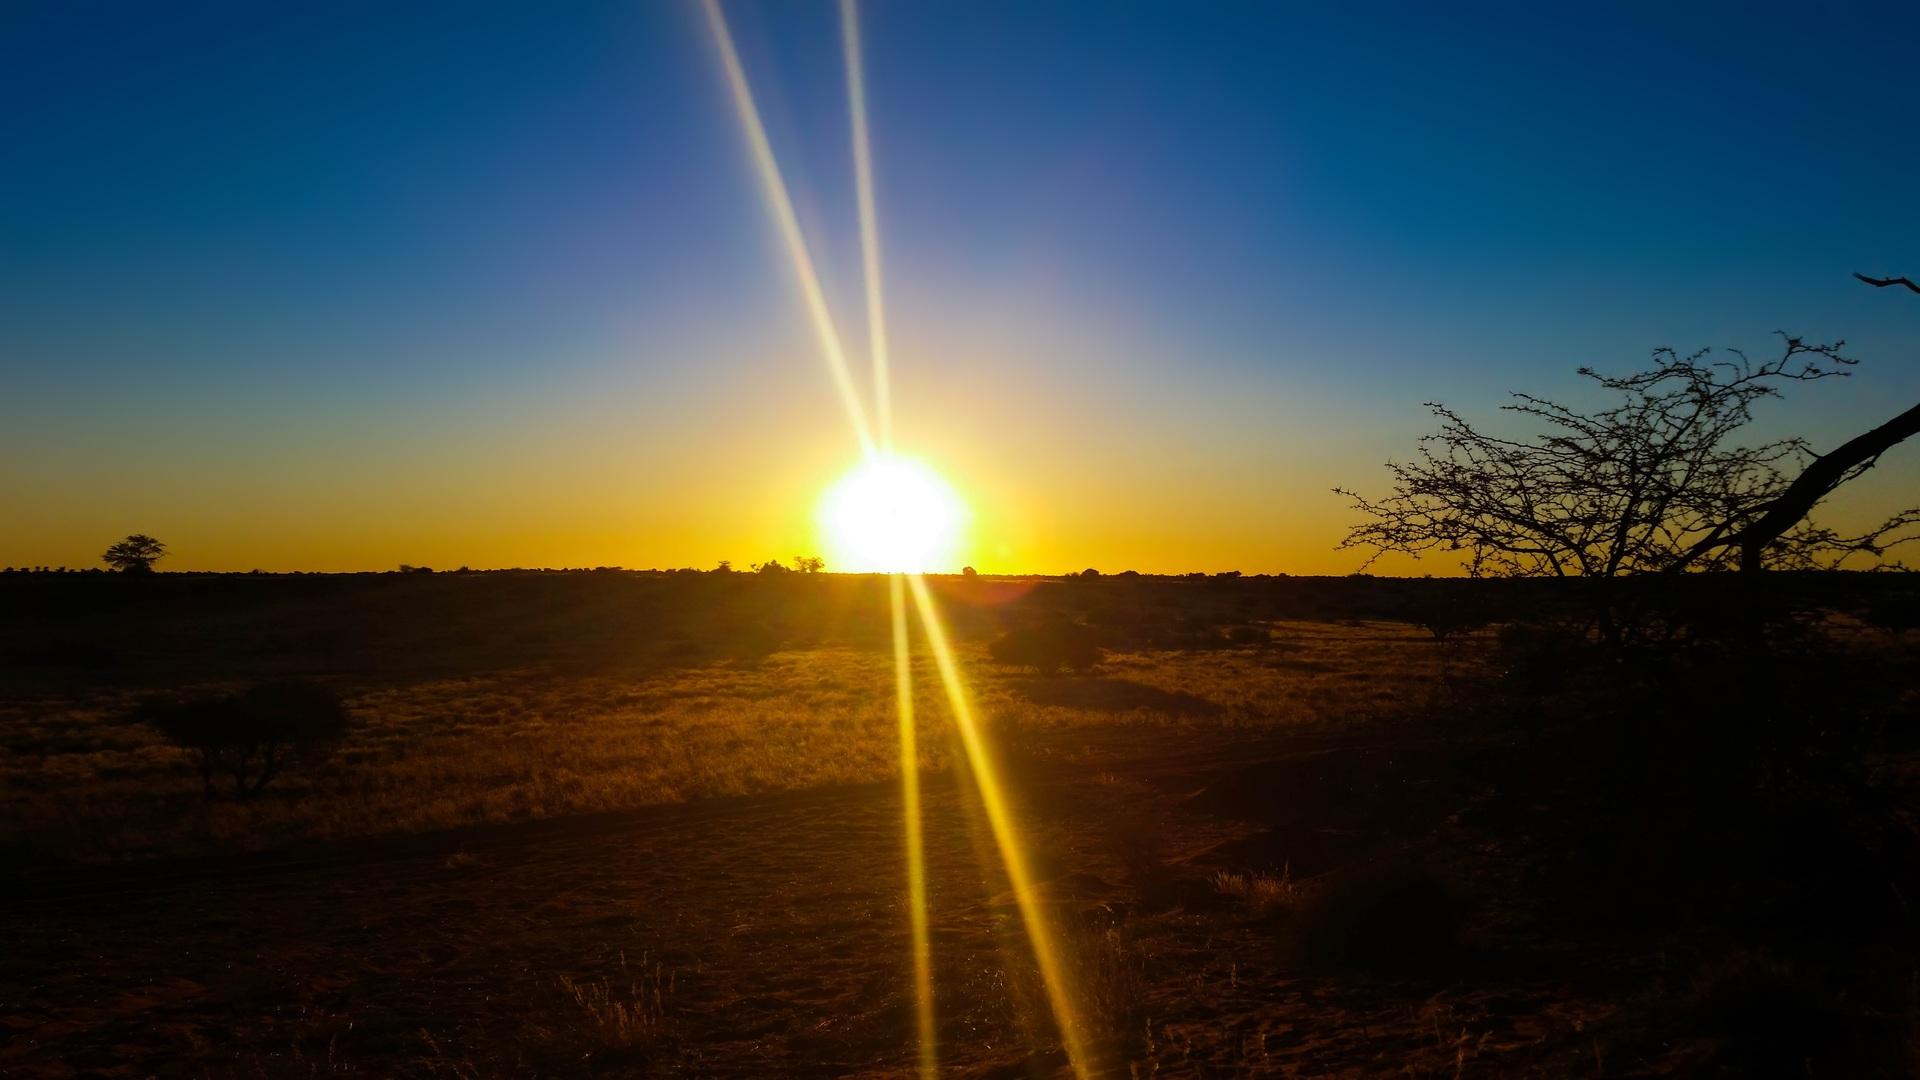 Namibia zdjęcia kolory afryka